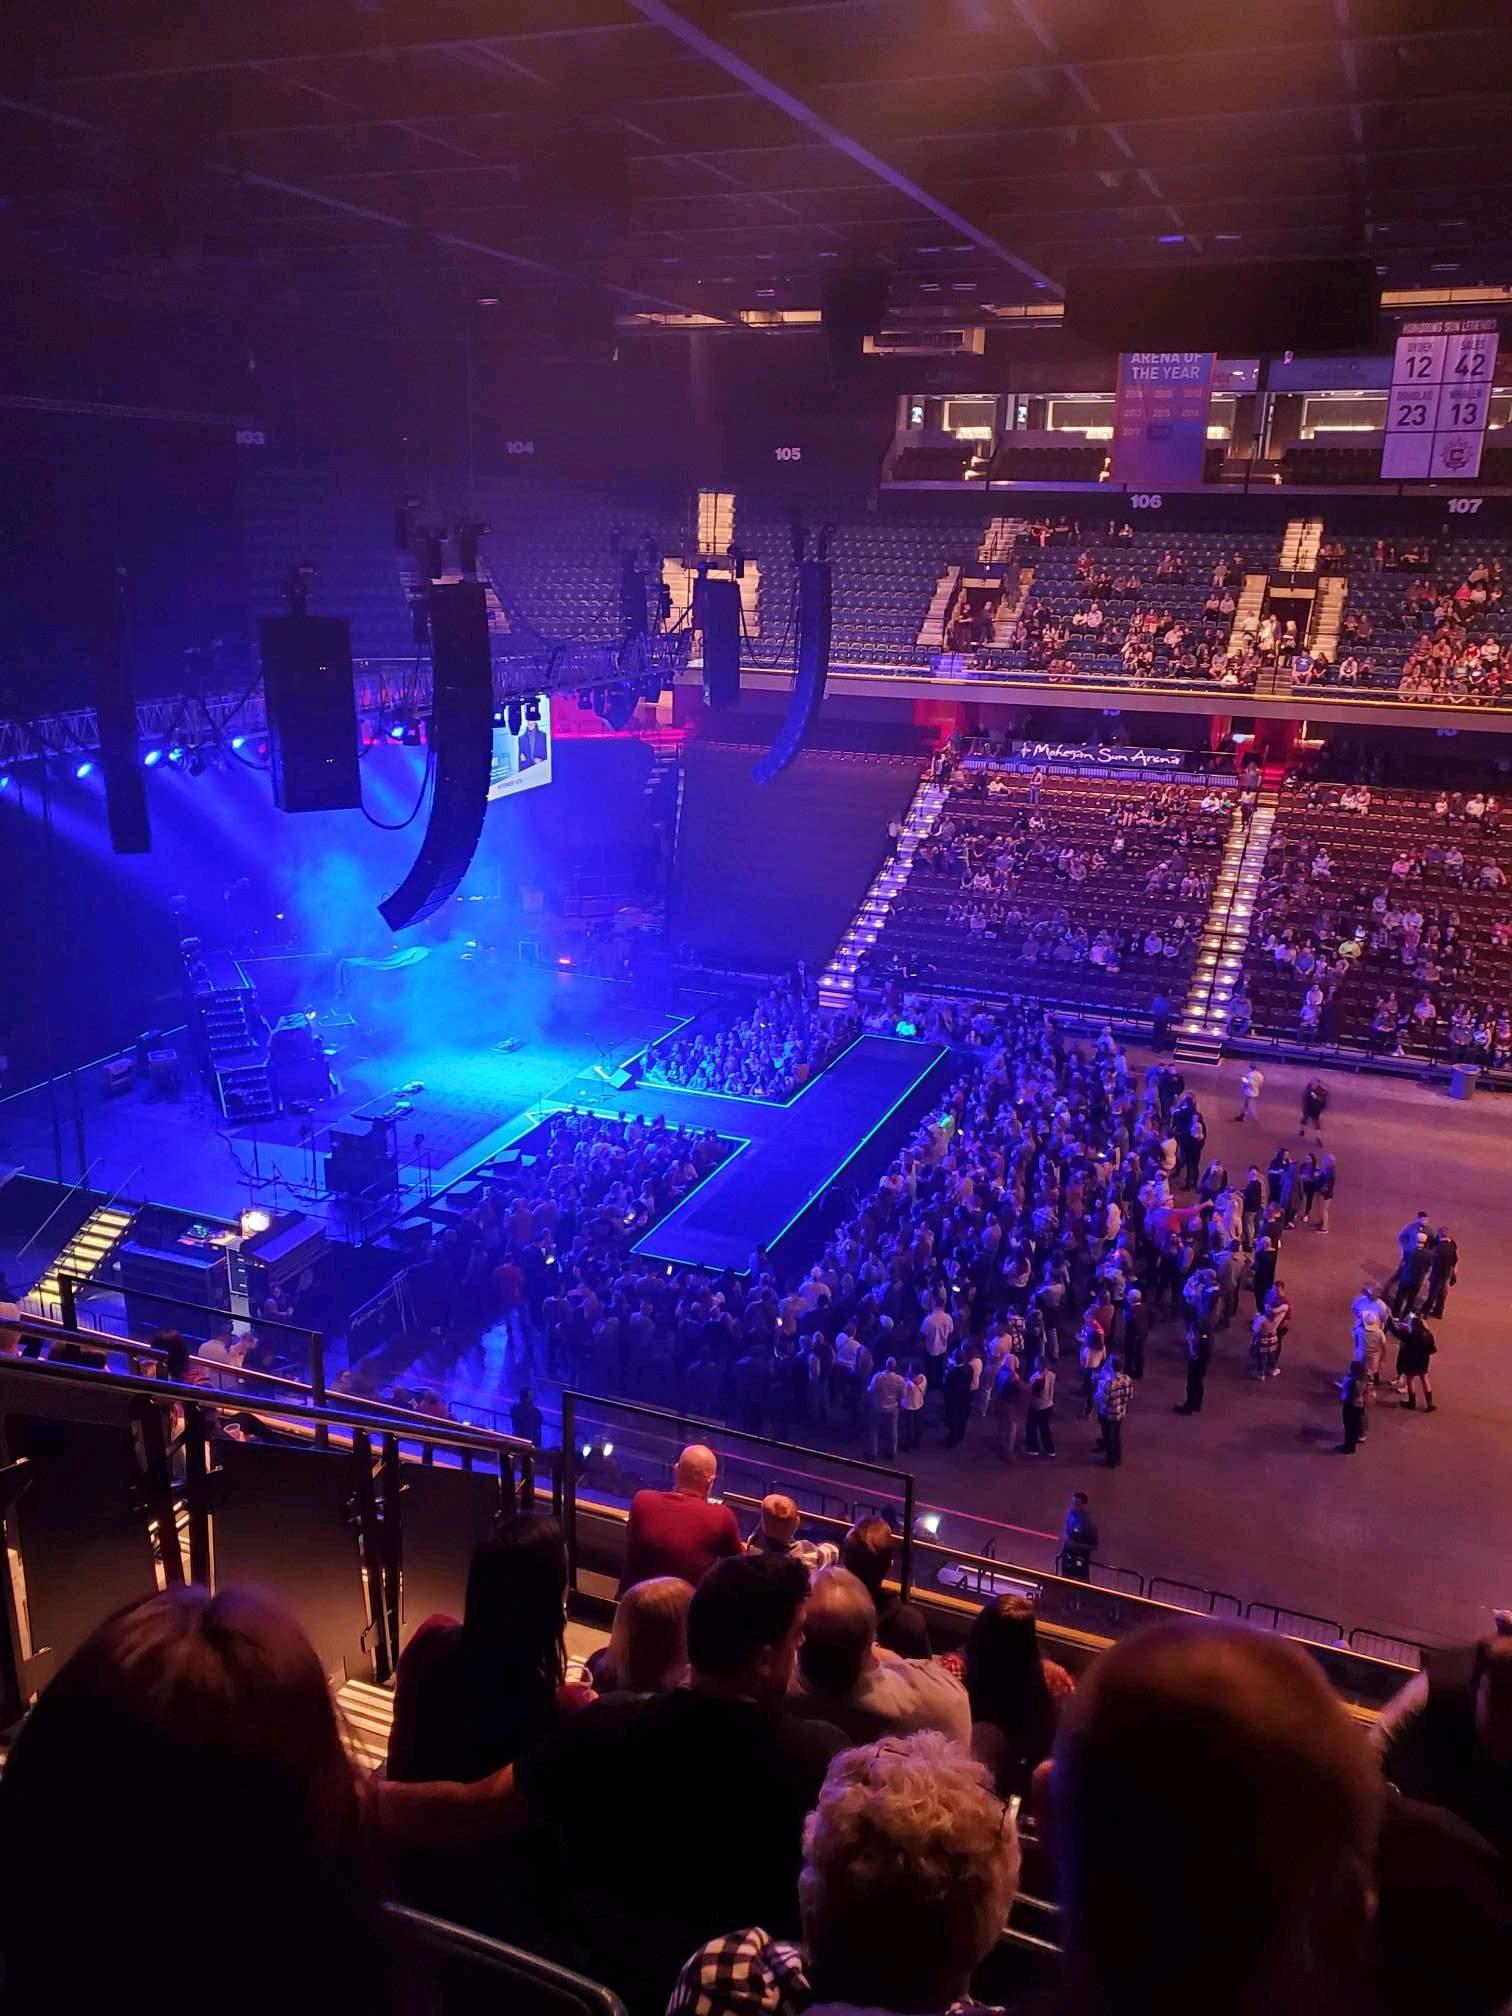 Mohegan Sun Arena Section 117 Row j Seat 15